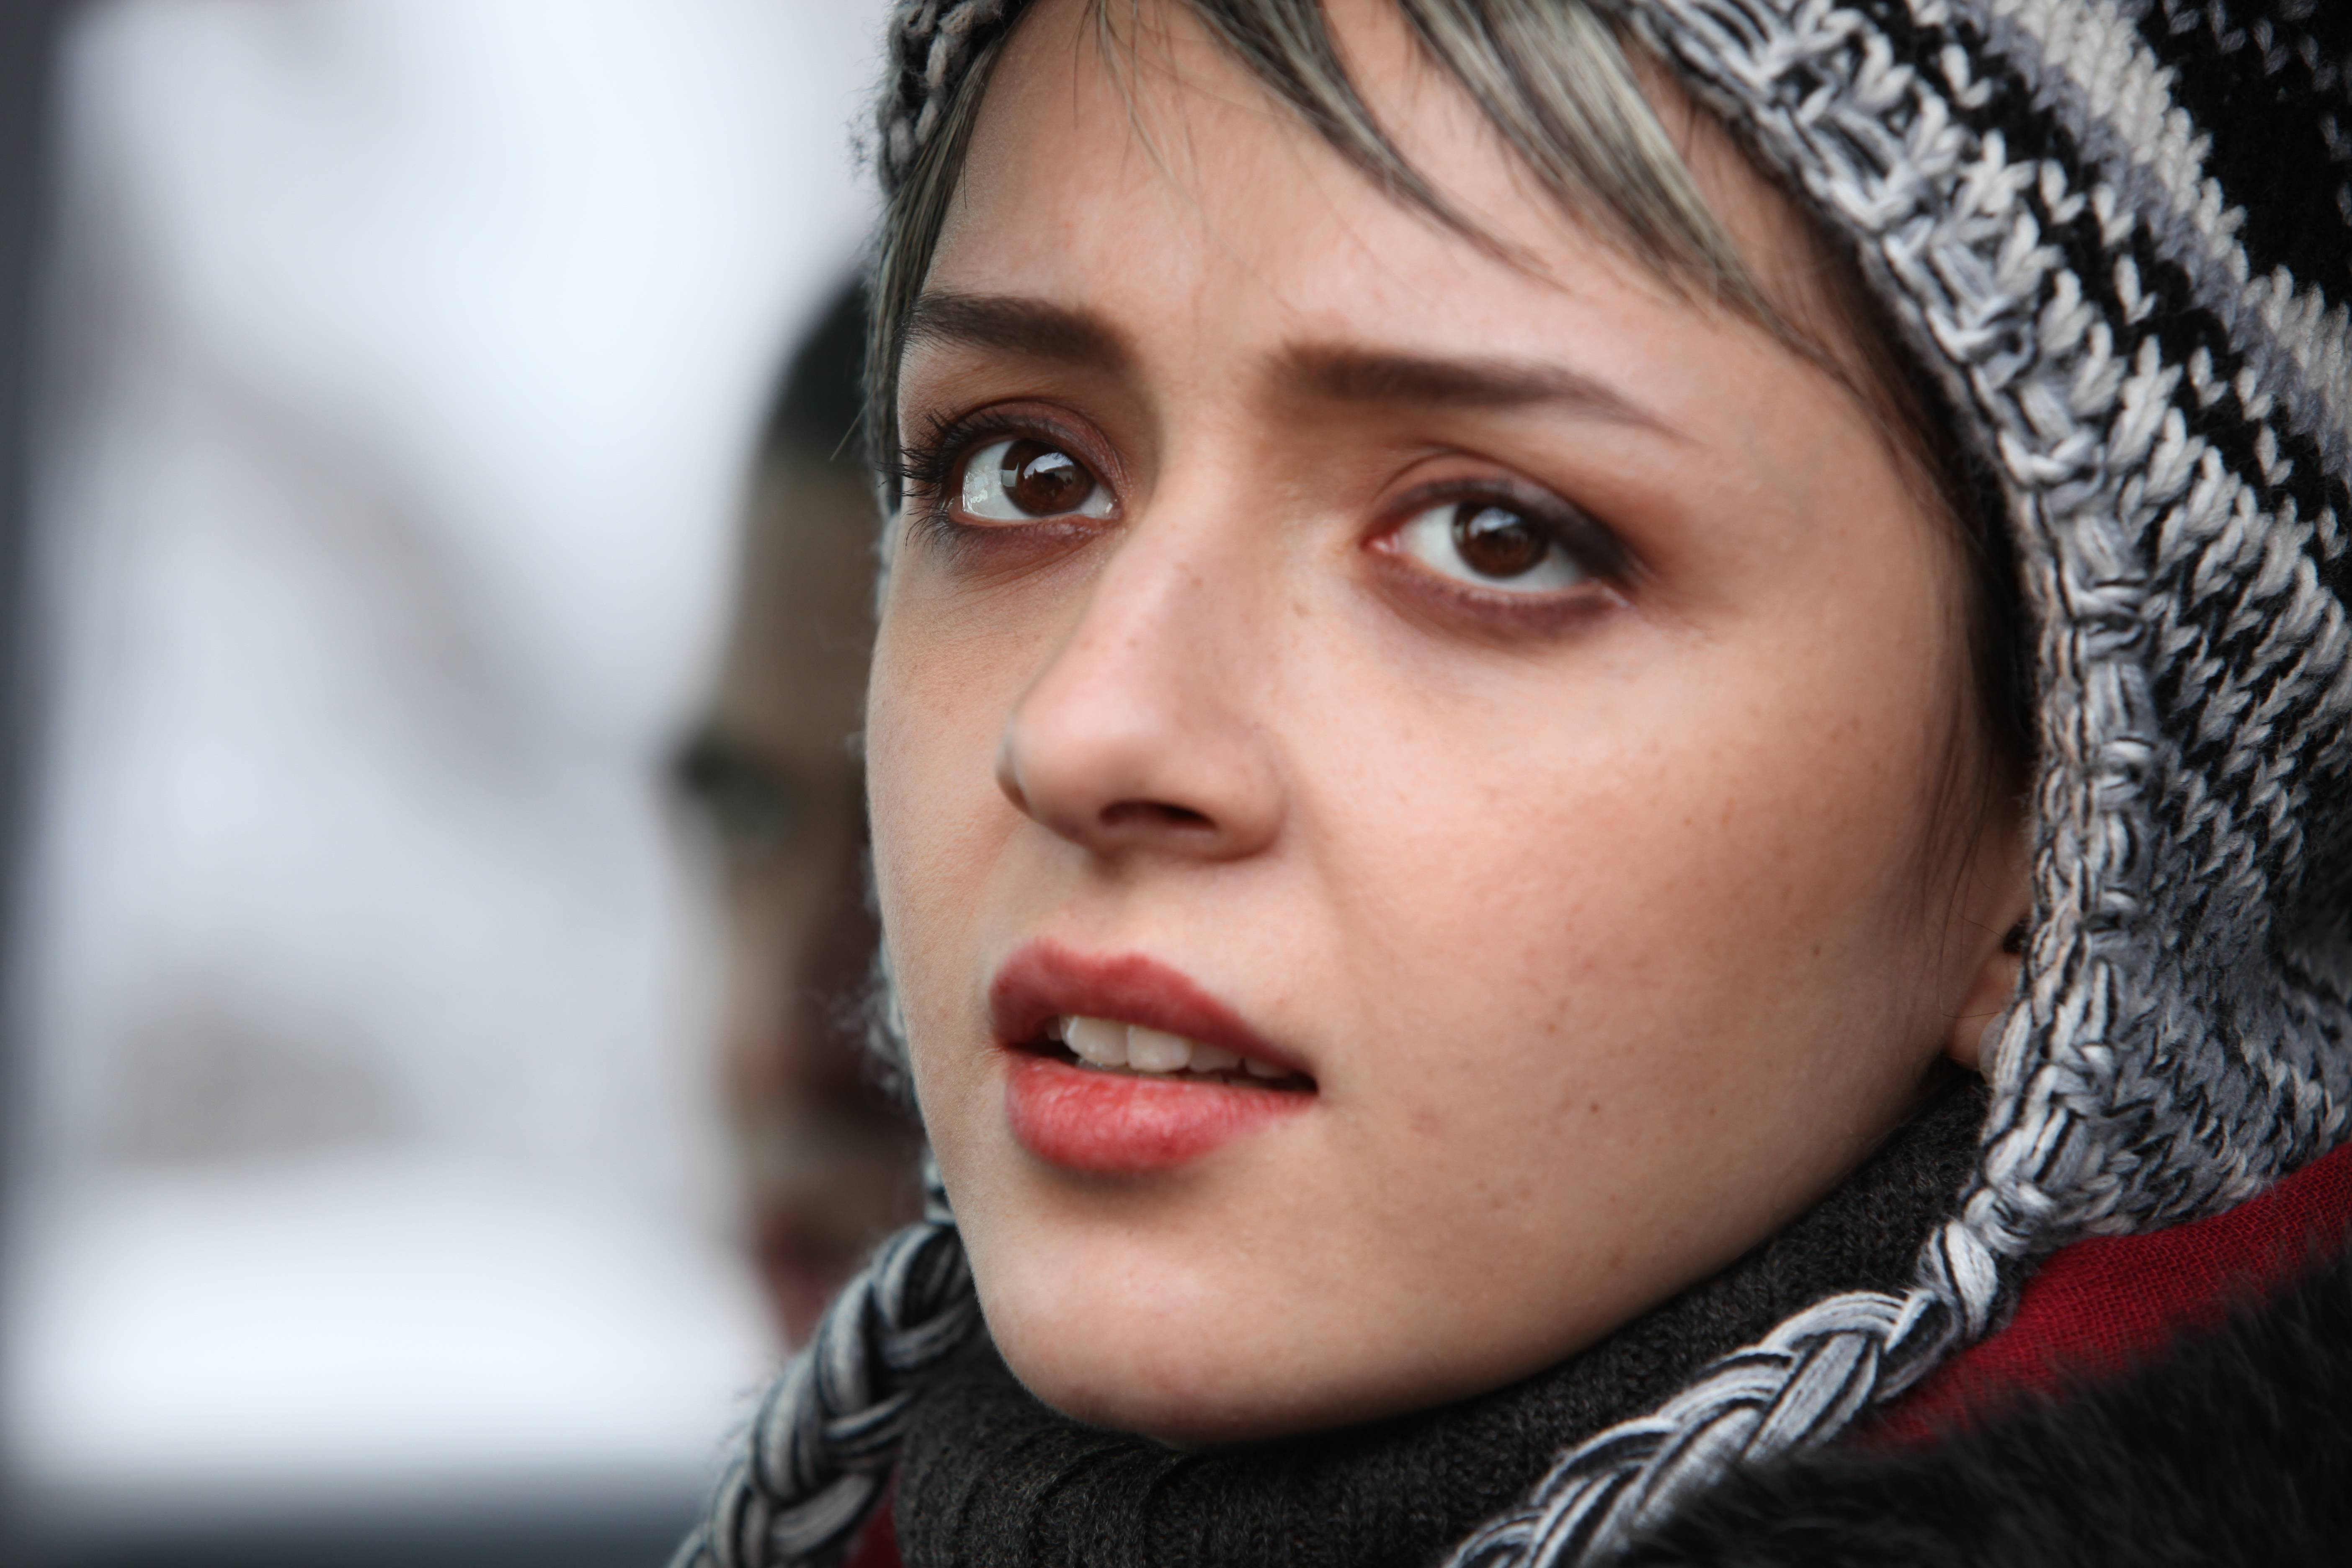 Taraneh Alidoosti Is The Iranian Actress To Watch The Iranian